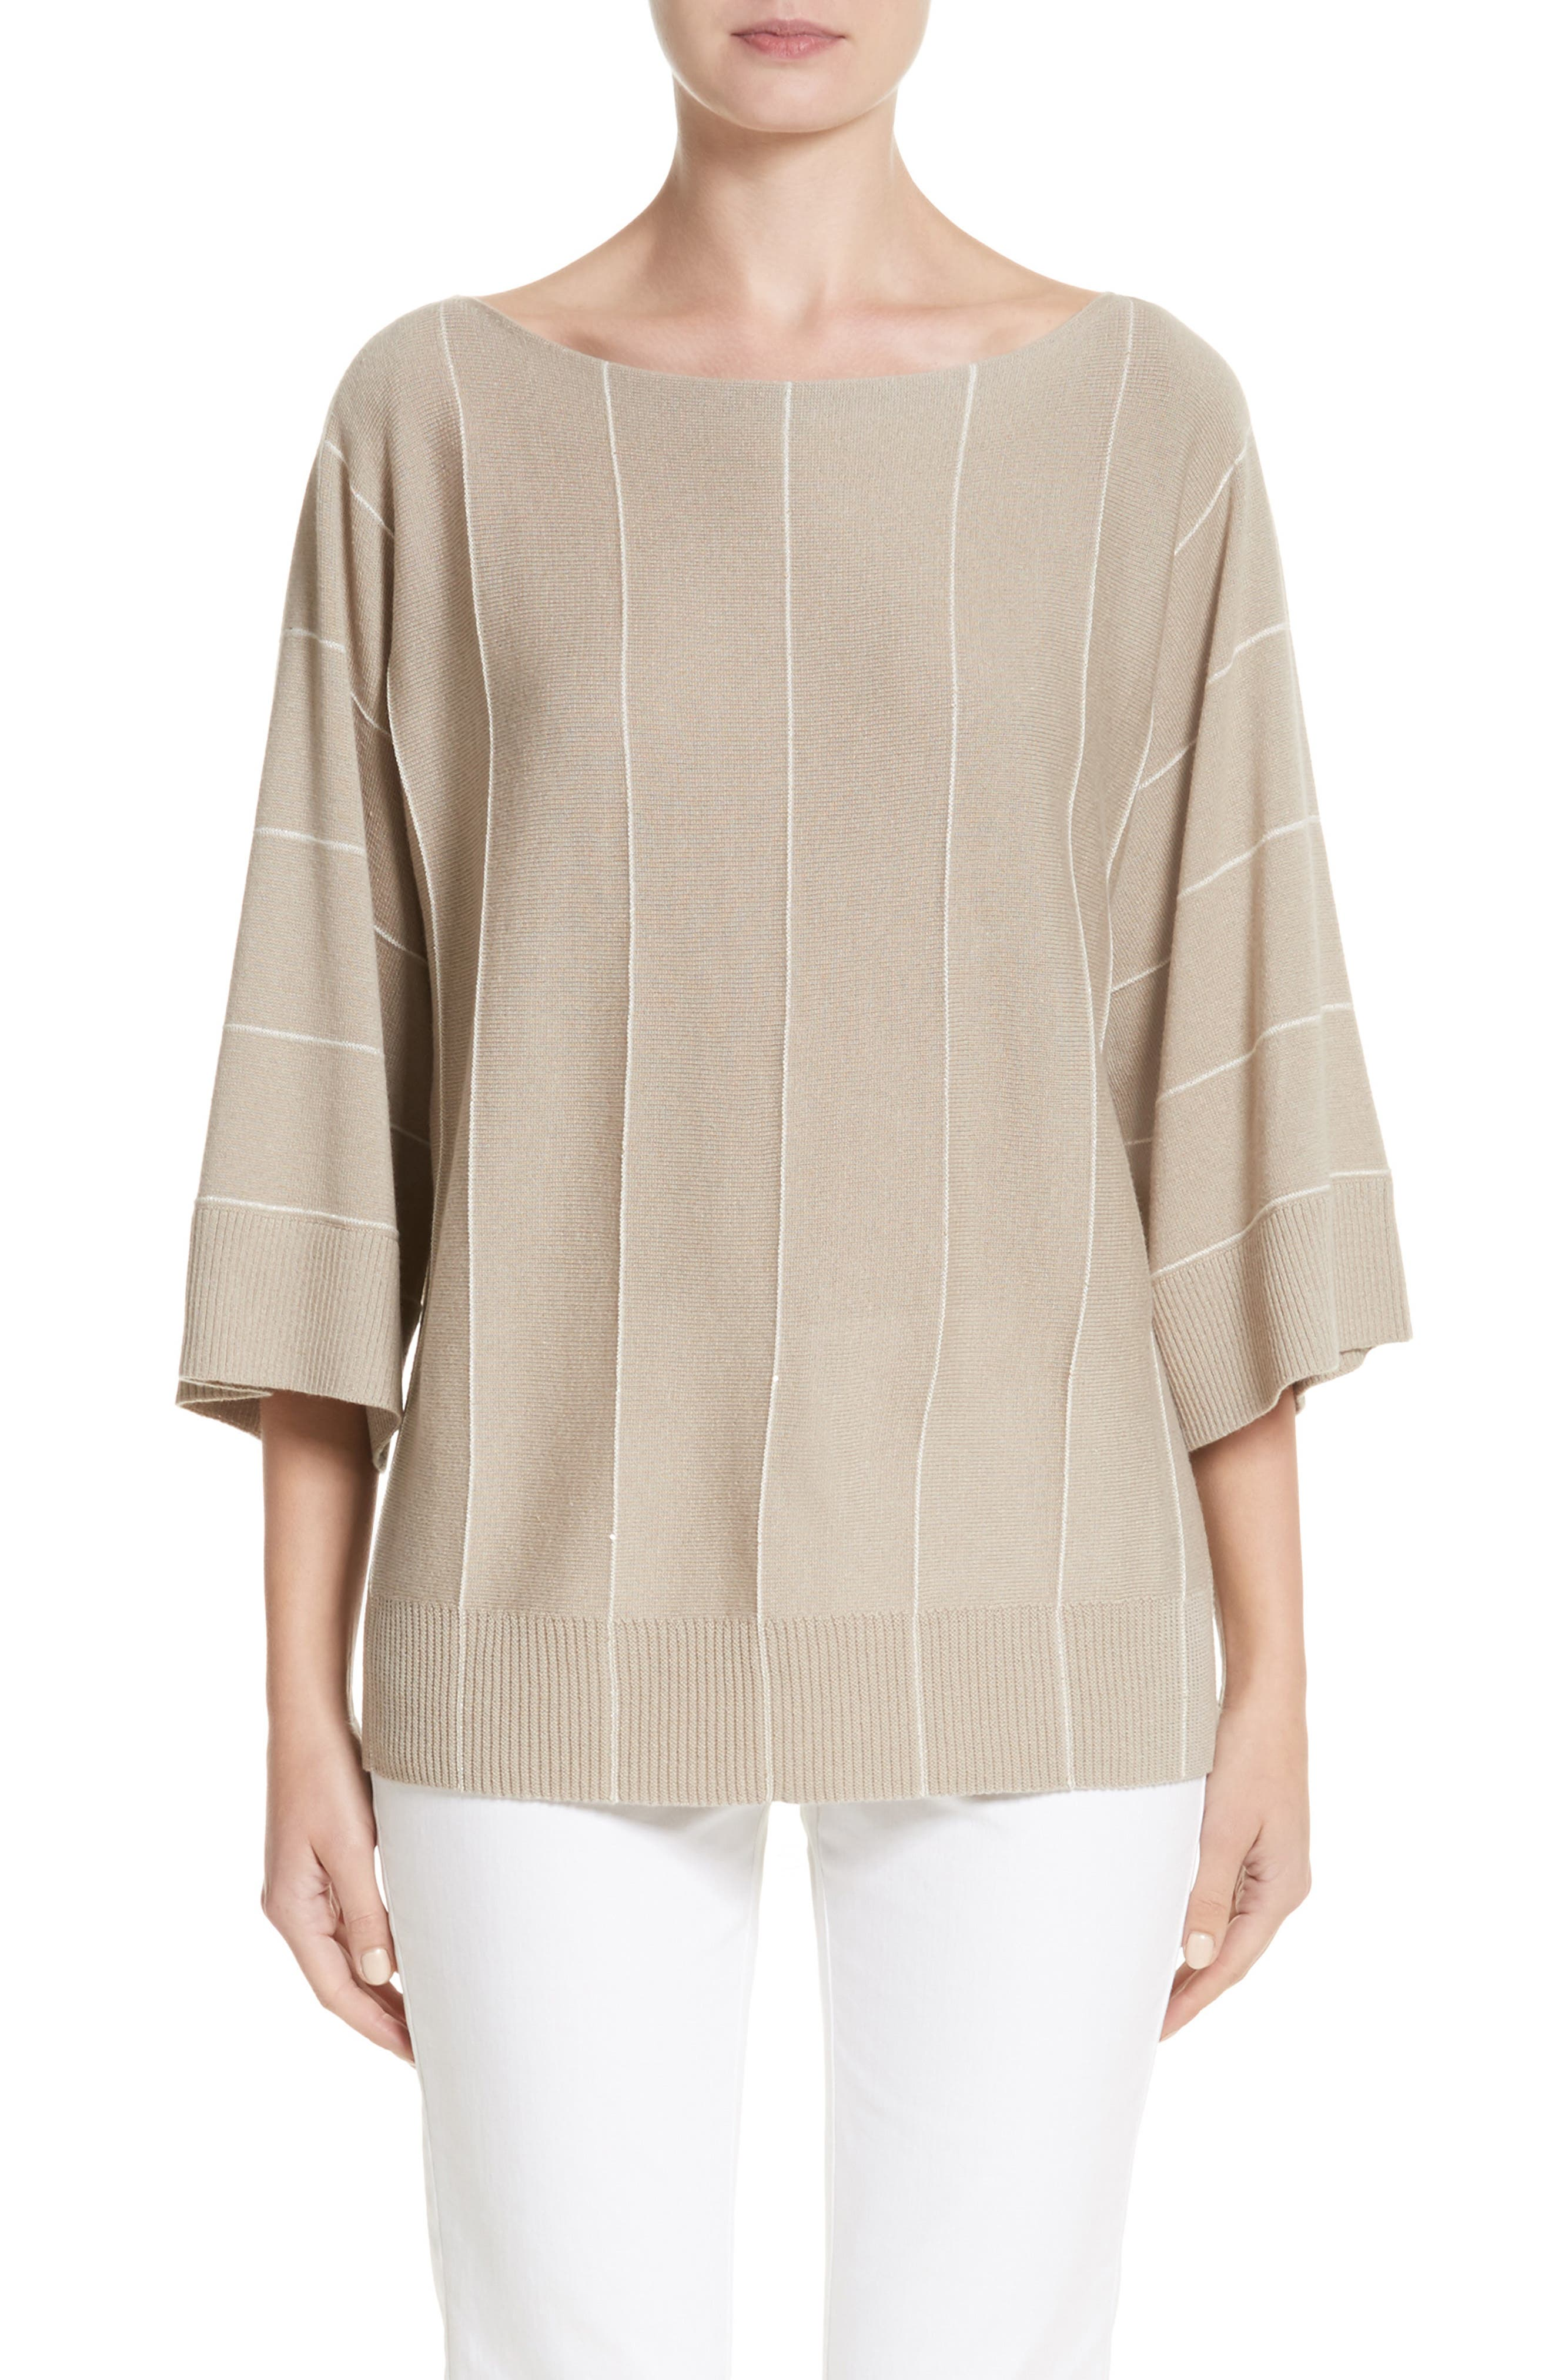 Sequin Knit Cashmere & Silk Pullover,                         Main,                         color, 200